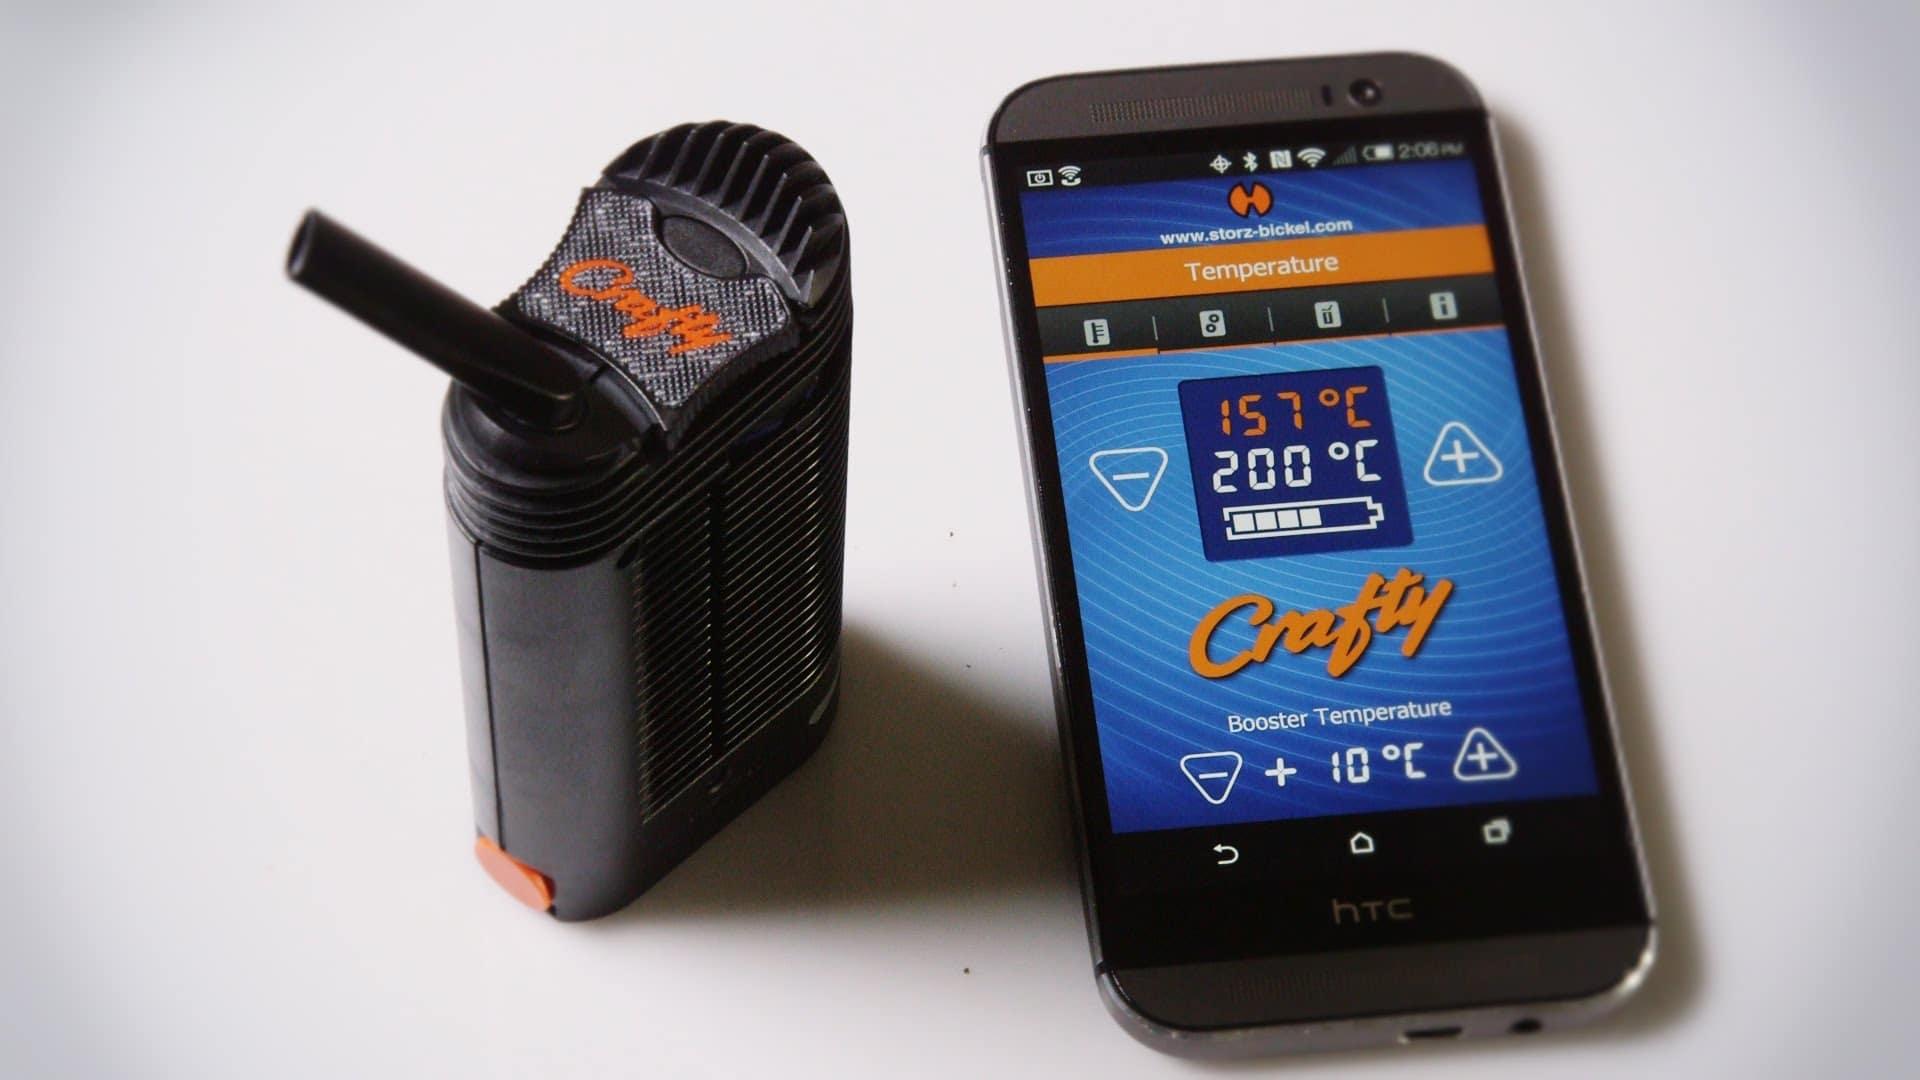 Crafty vaporizer Smartphone